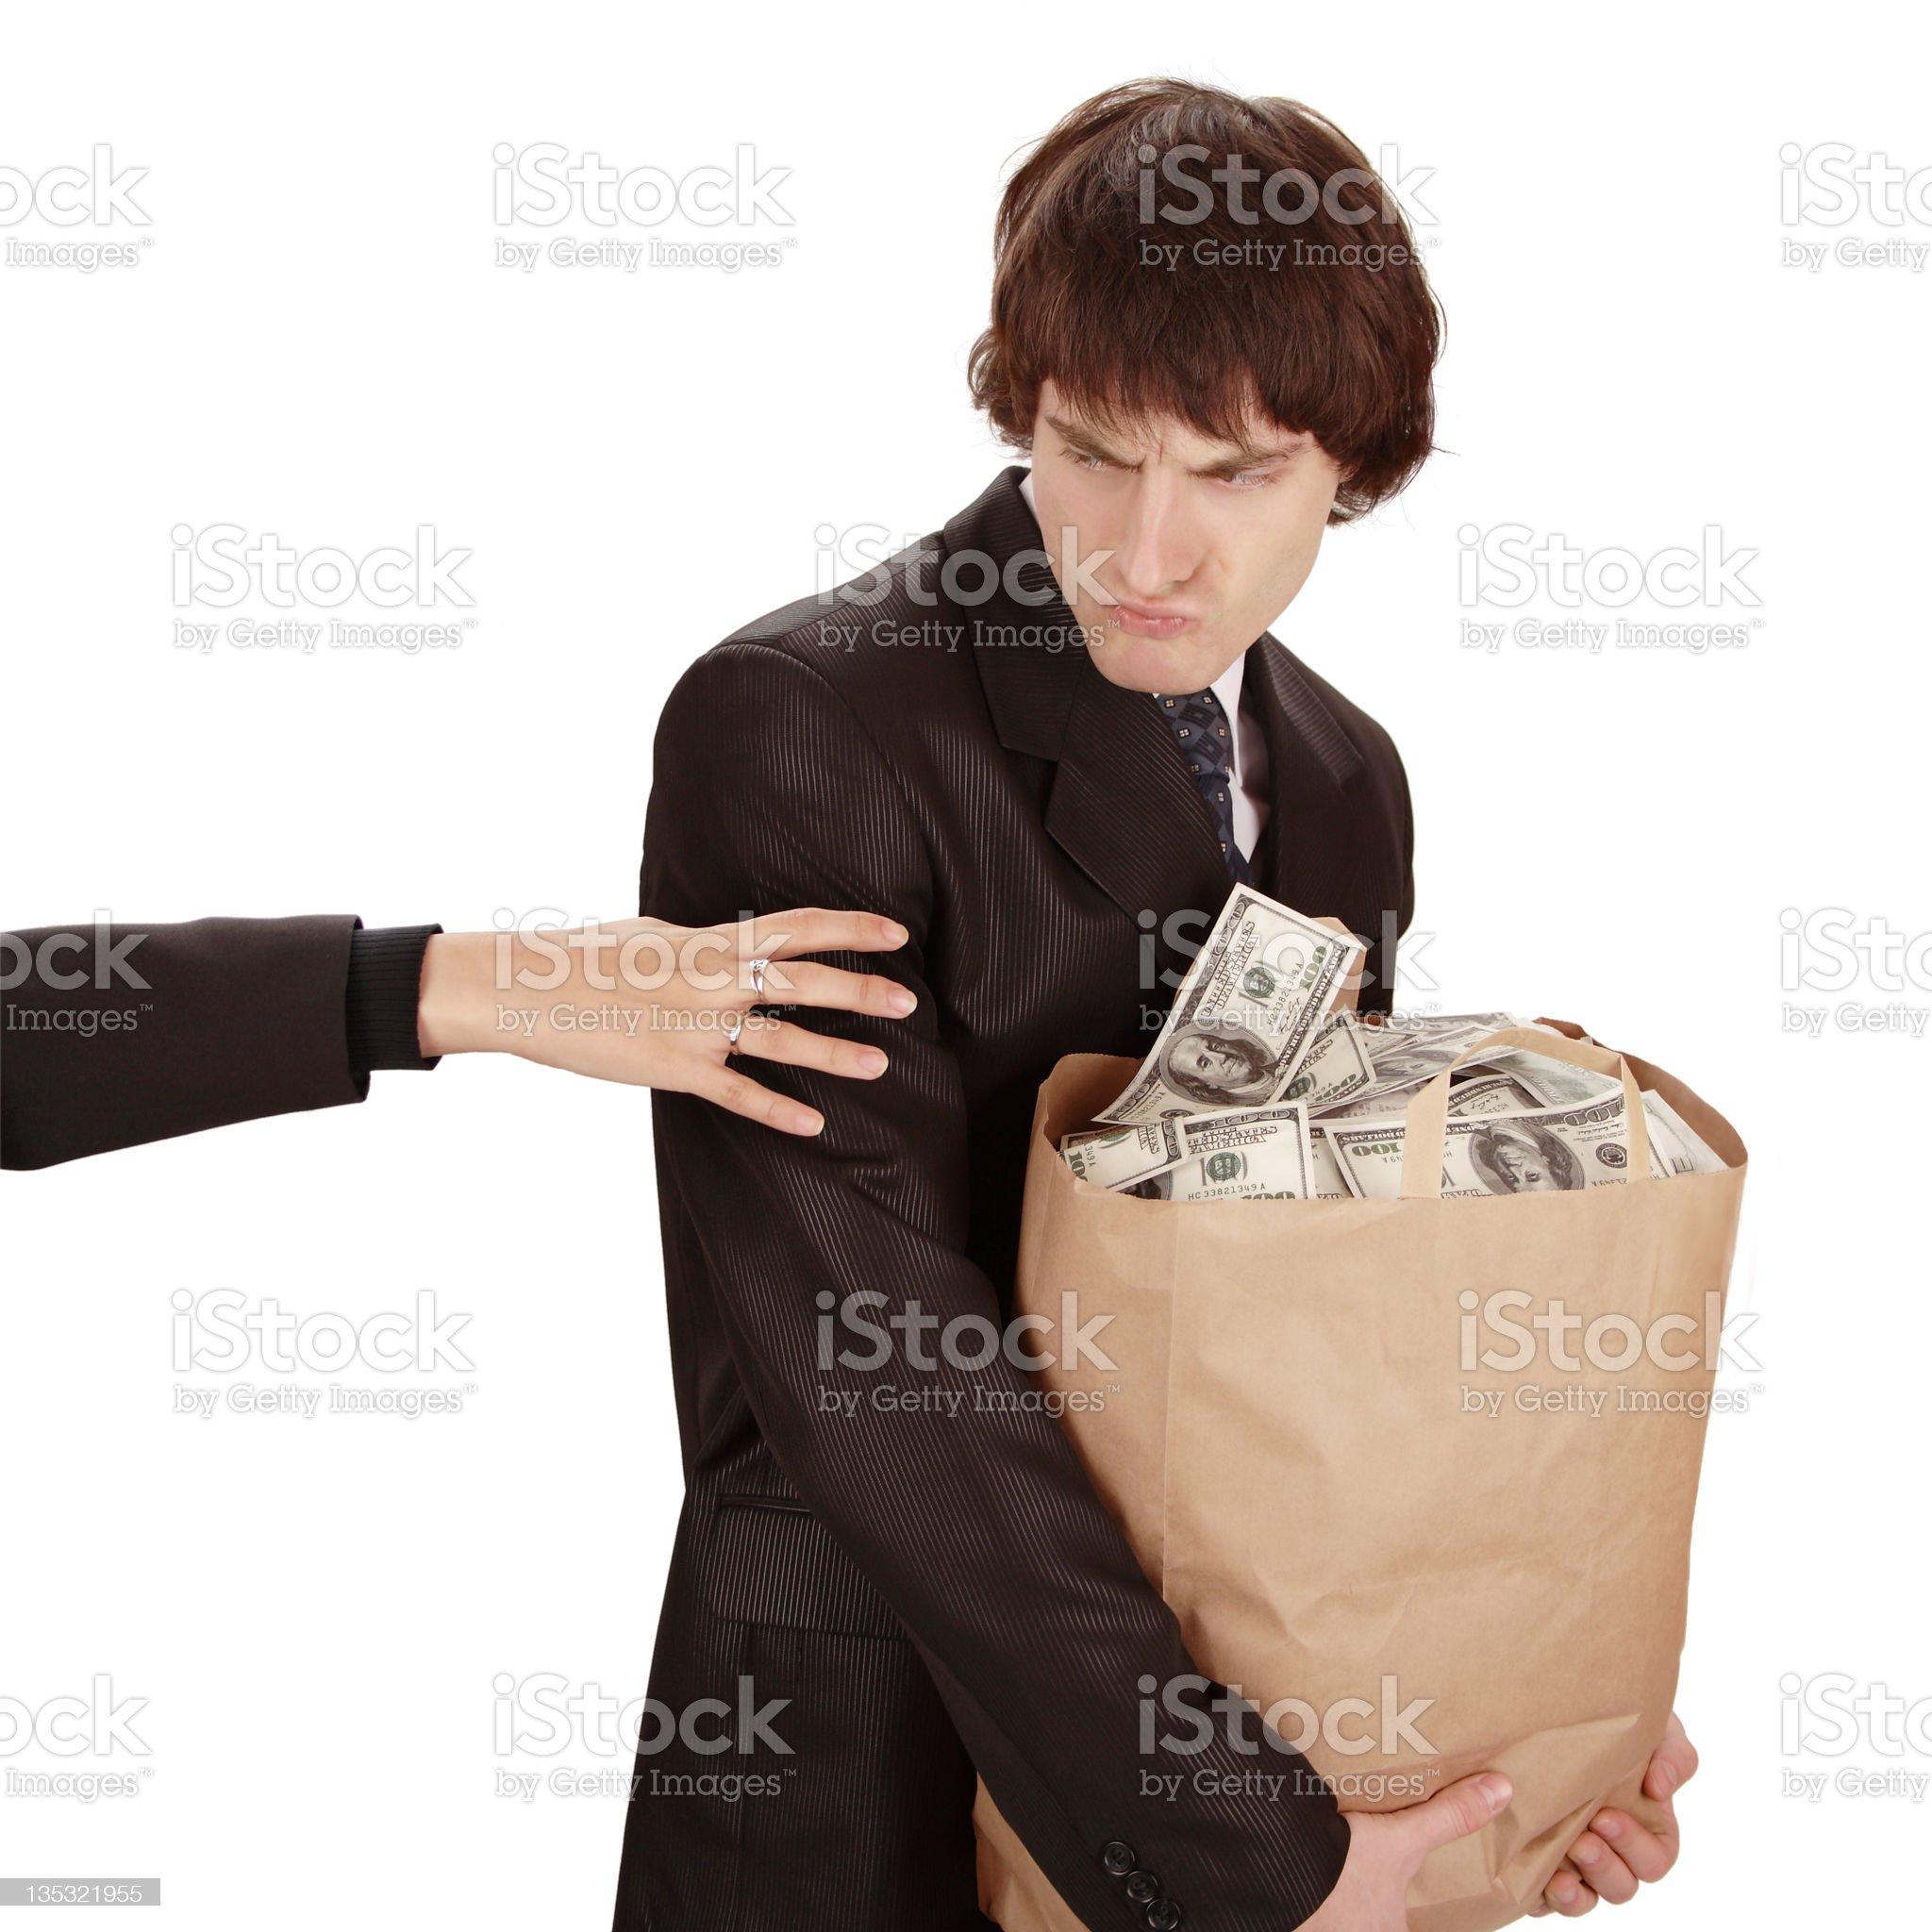 It's my money! royalty-free stock photo